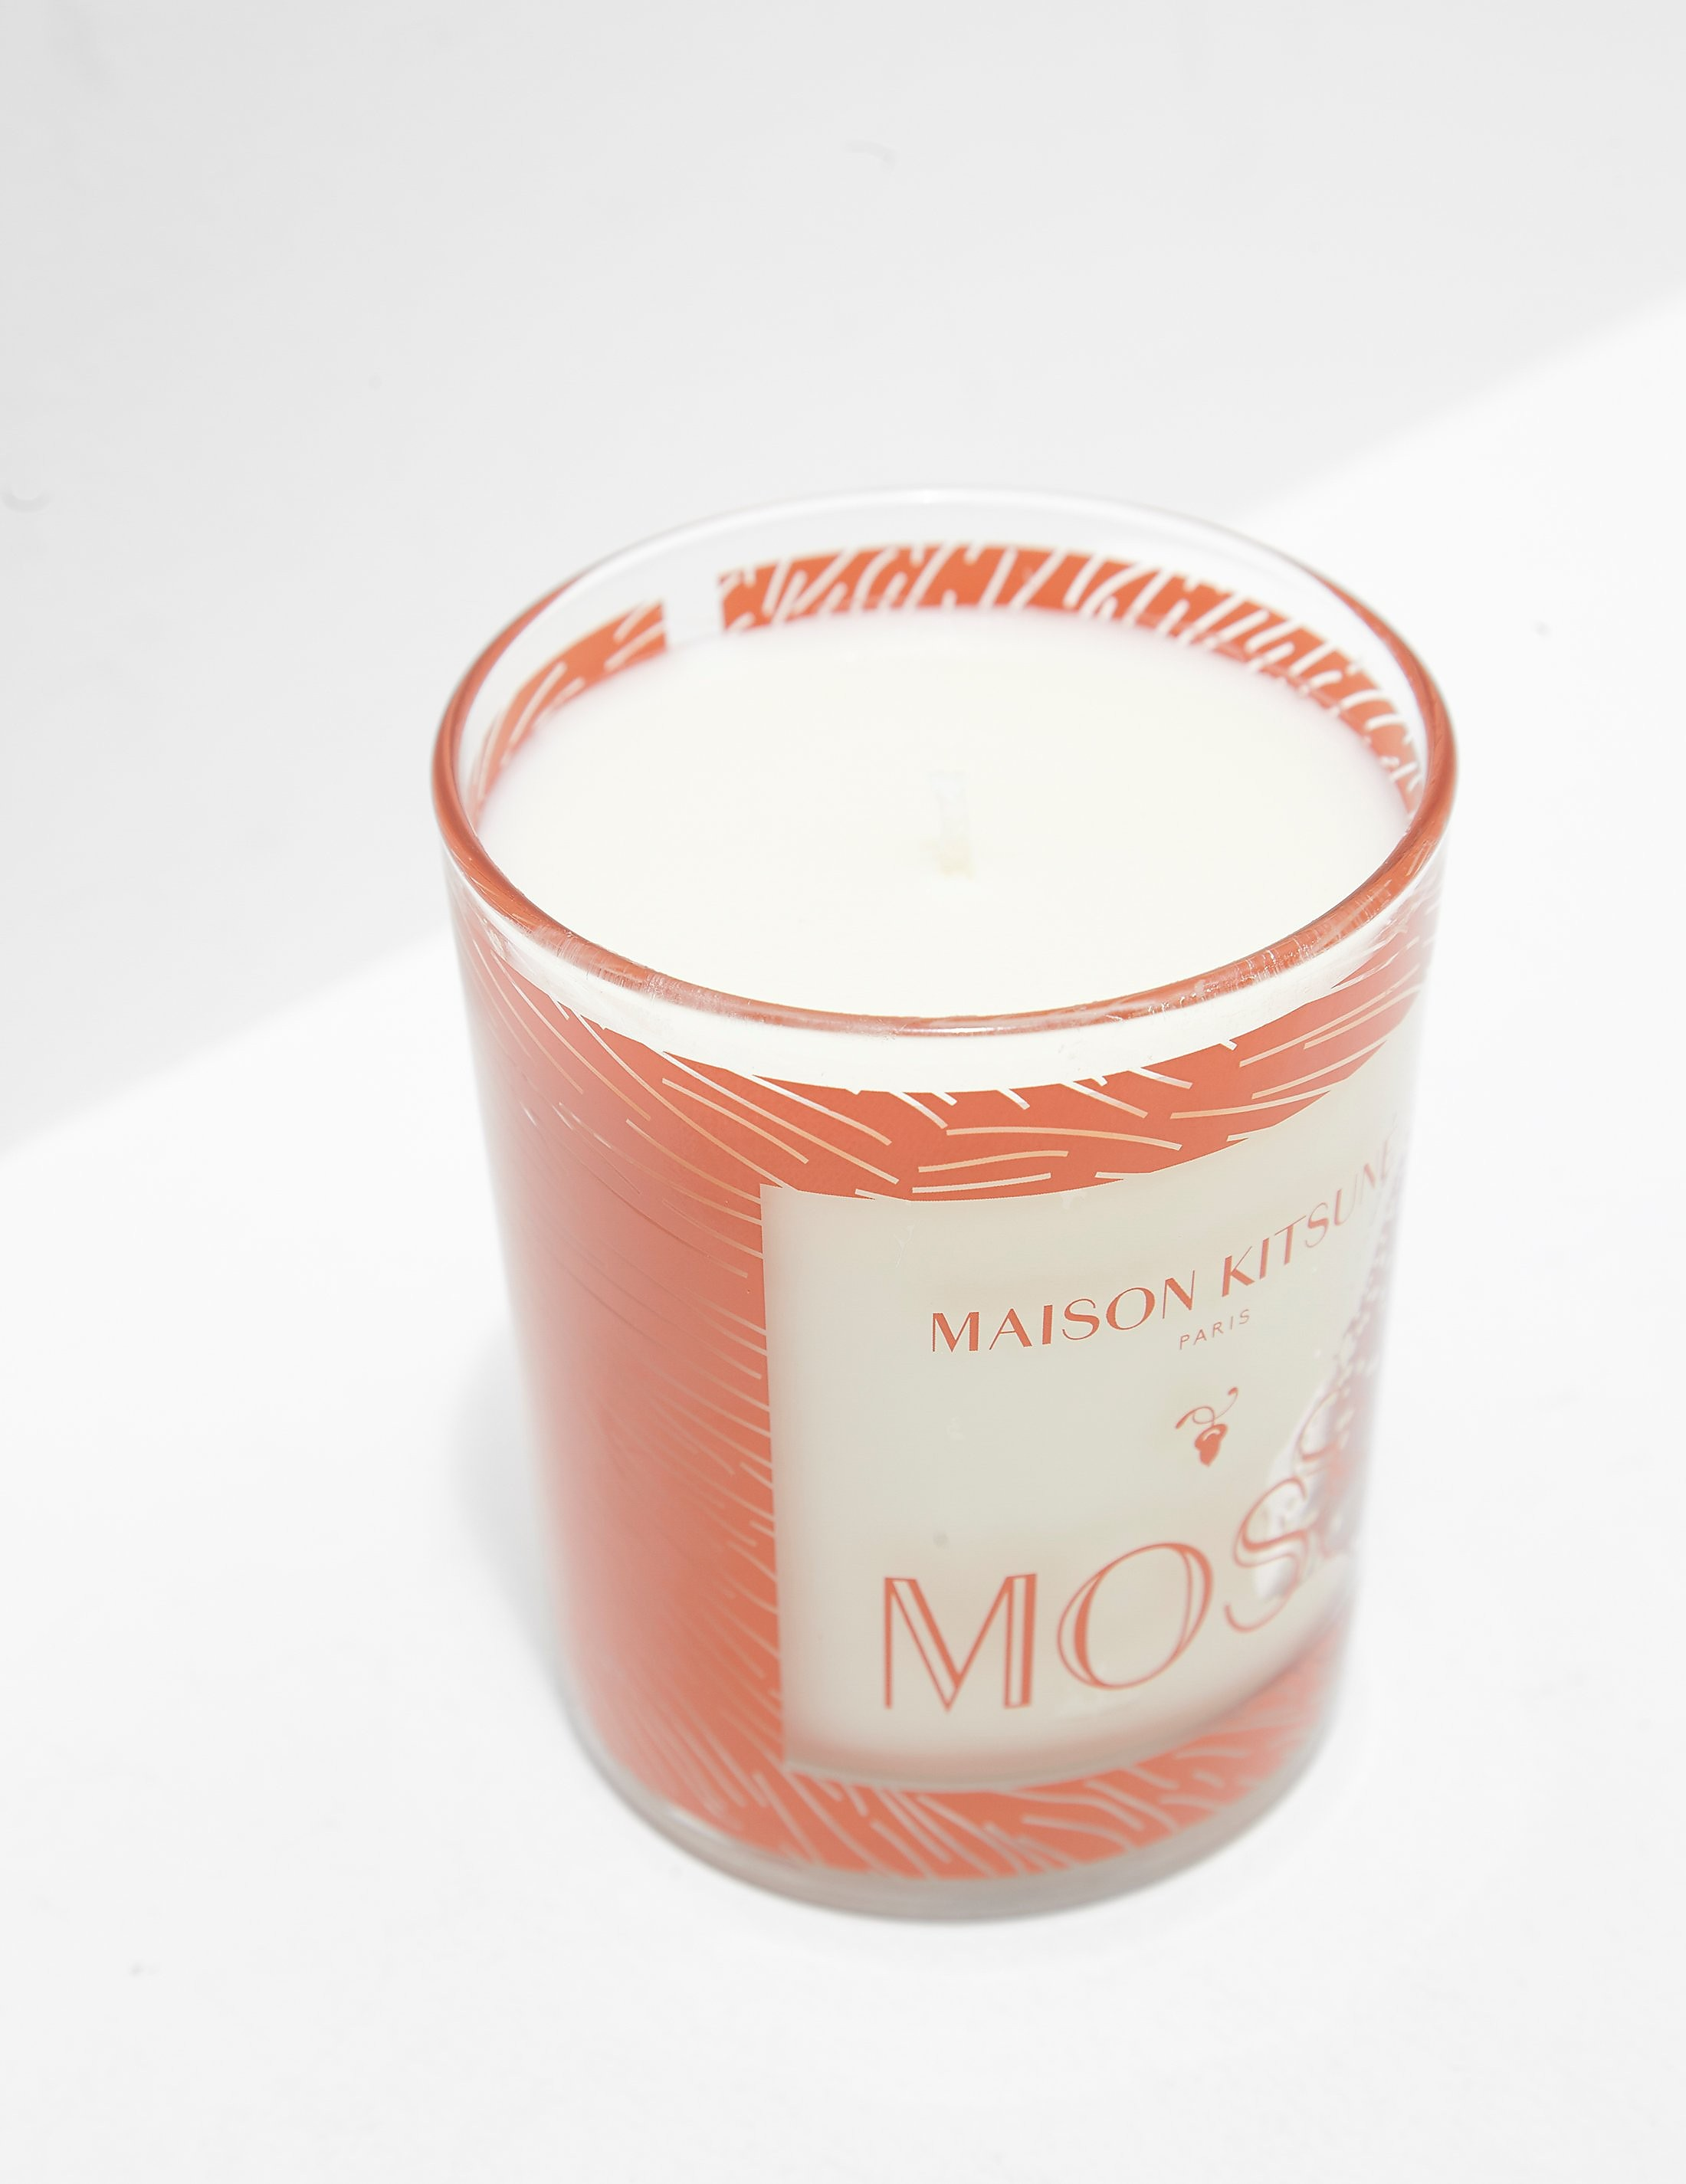 Maison Kitsune Moss Candle